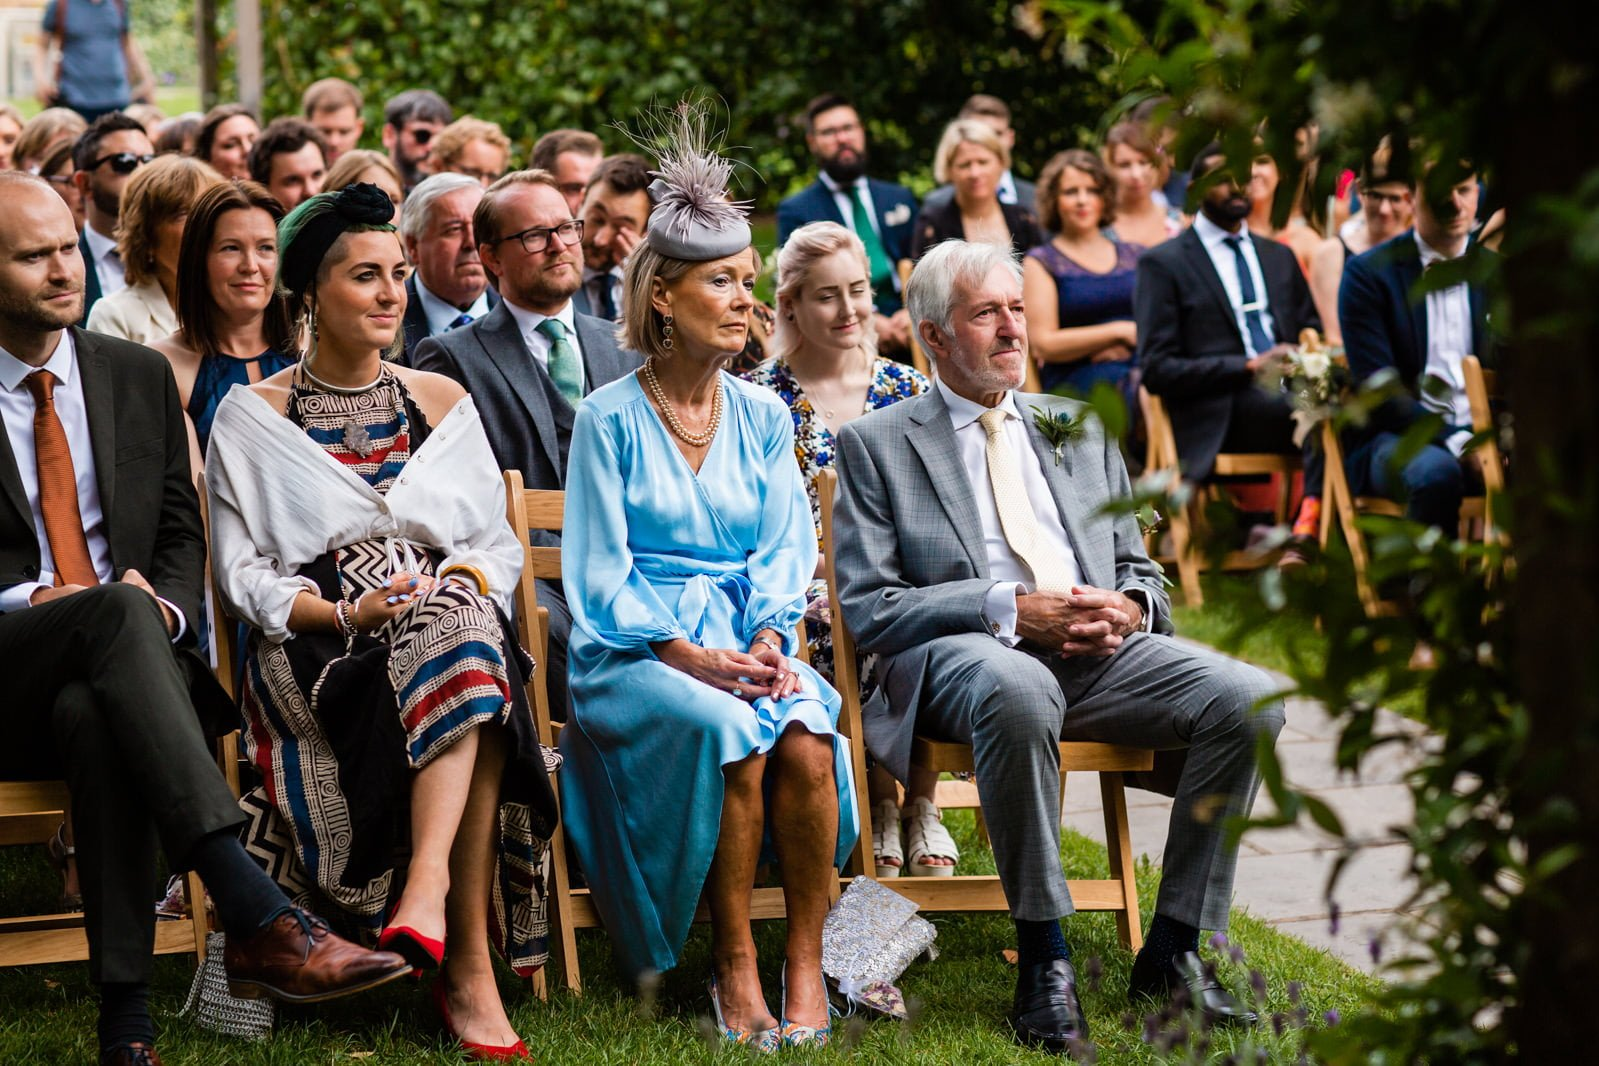 Millbridge Court Wedding - stunning summer wedding - wedding photography 51